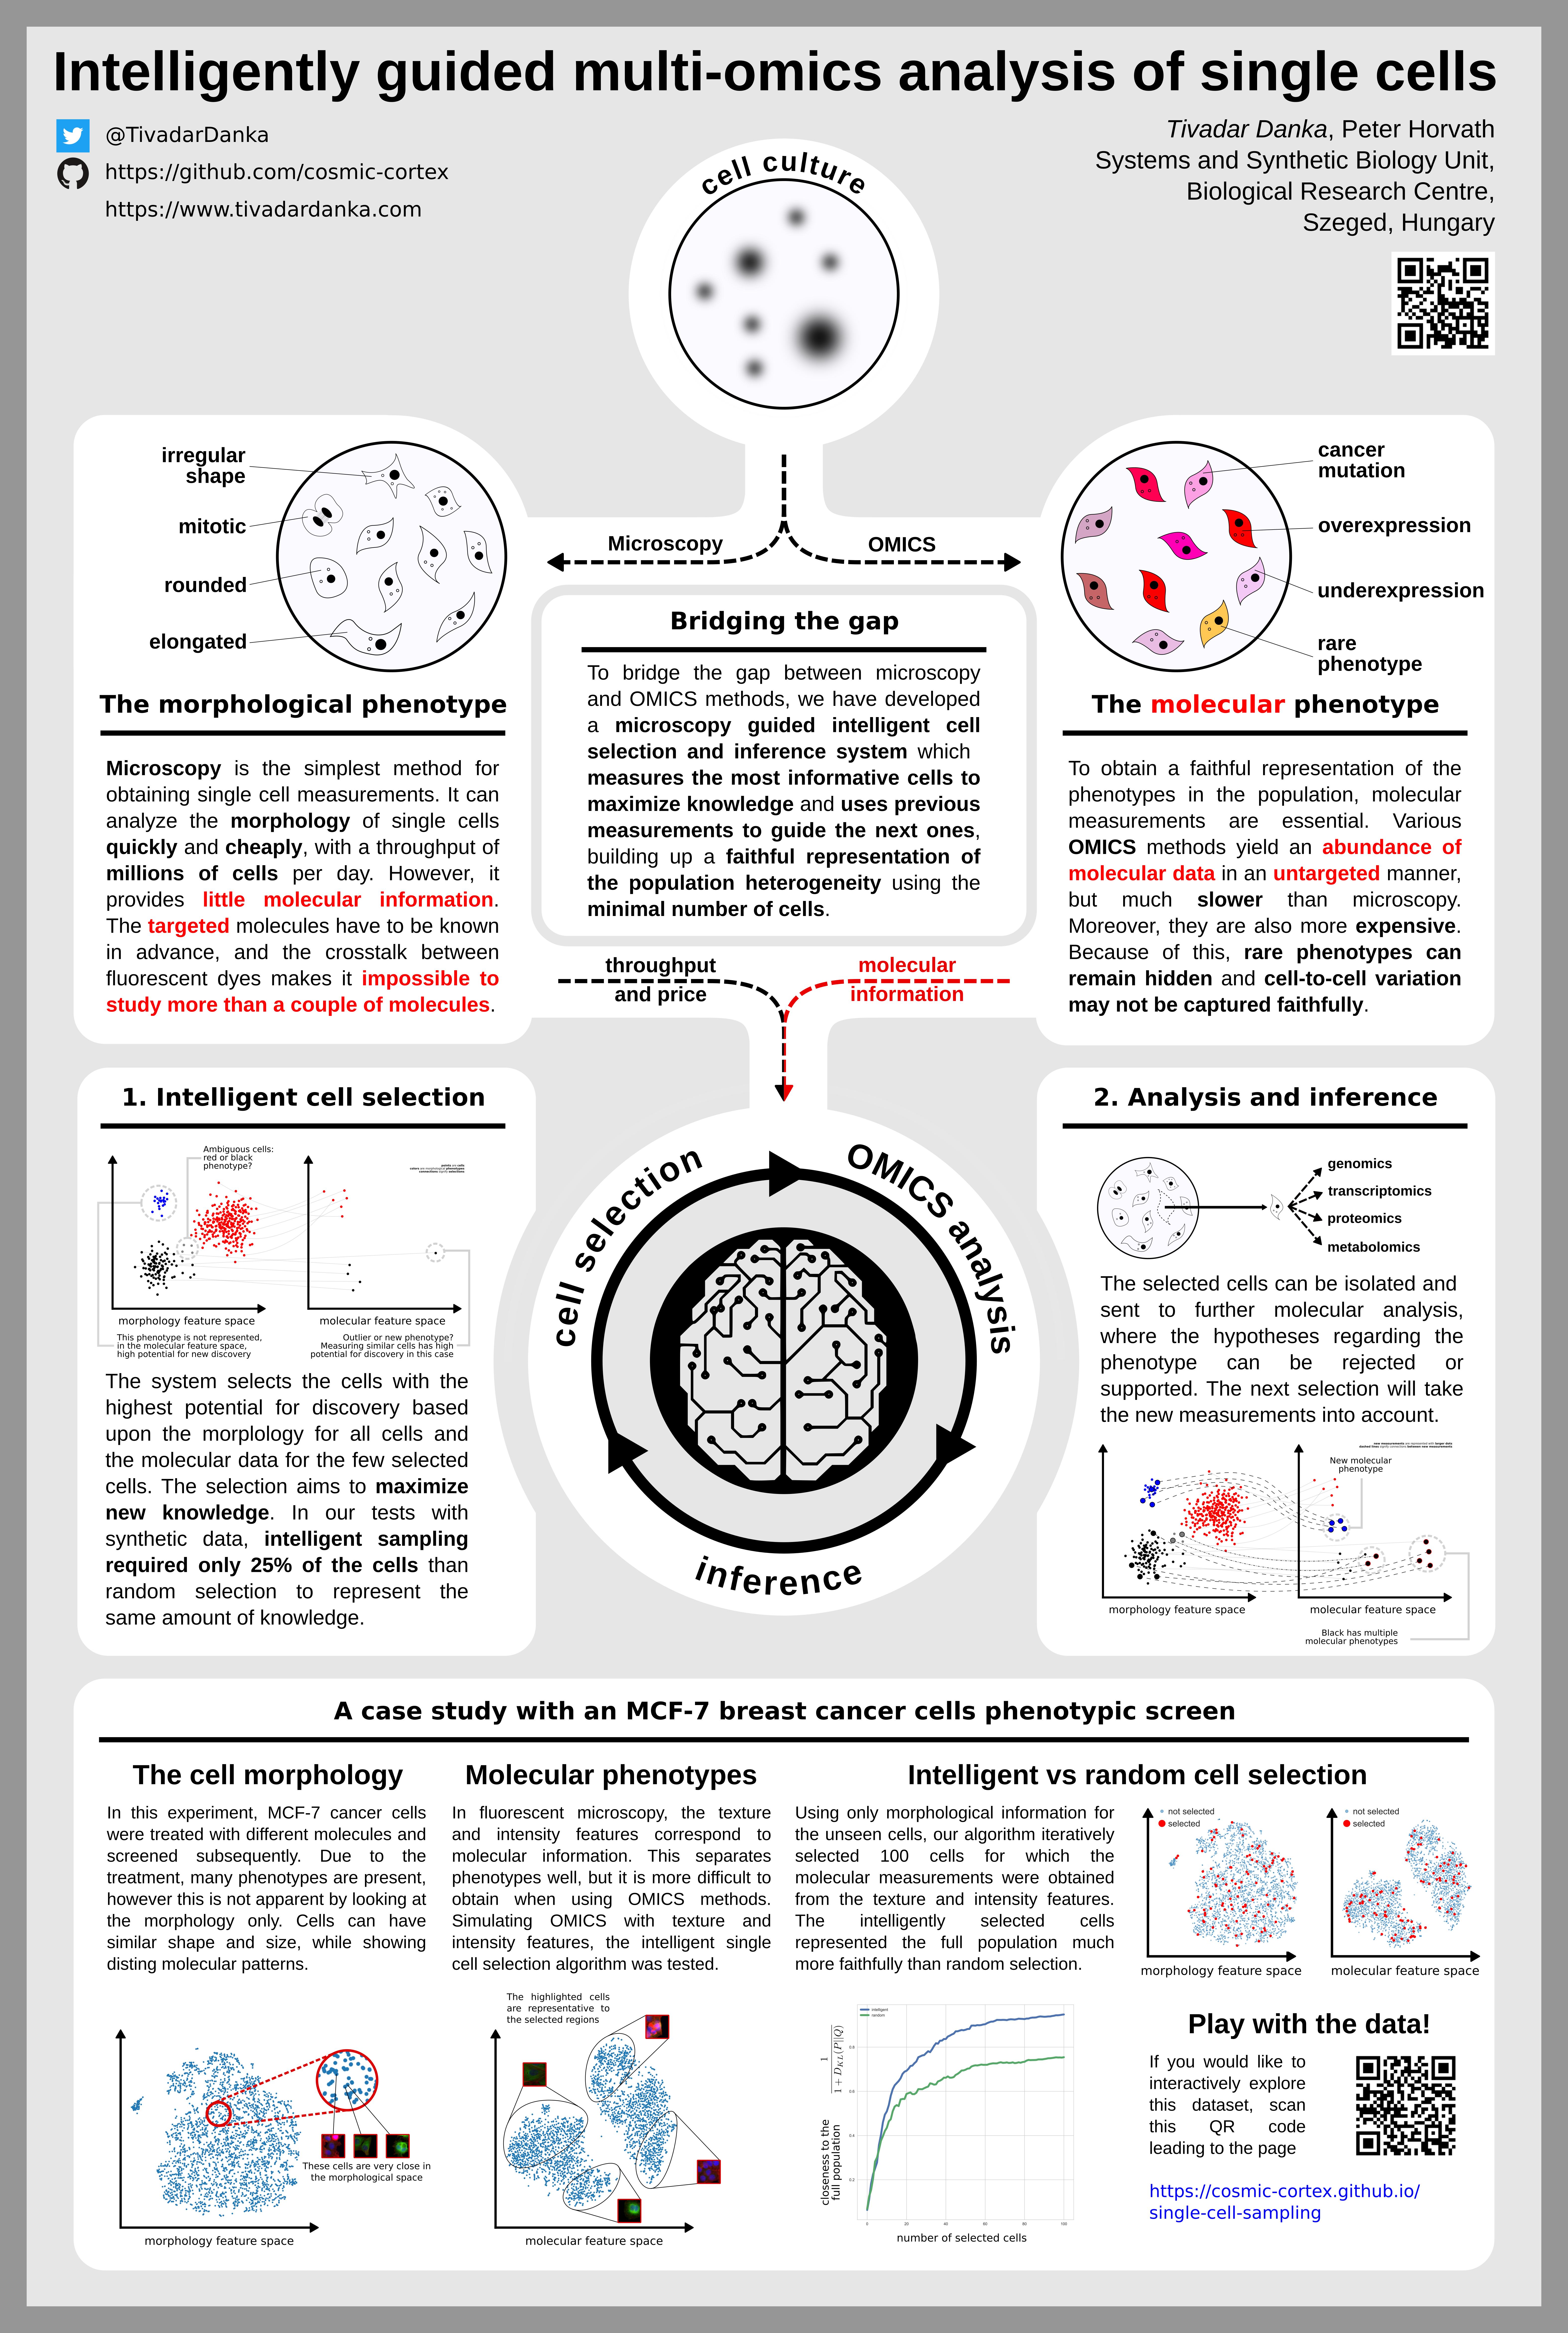 Research – Tivadar Danka